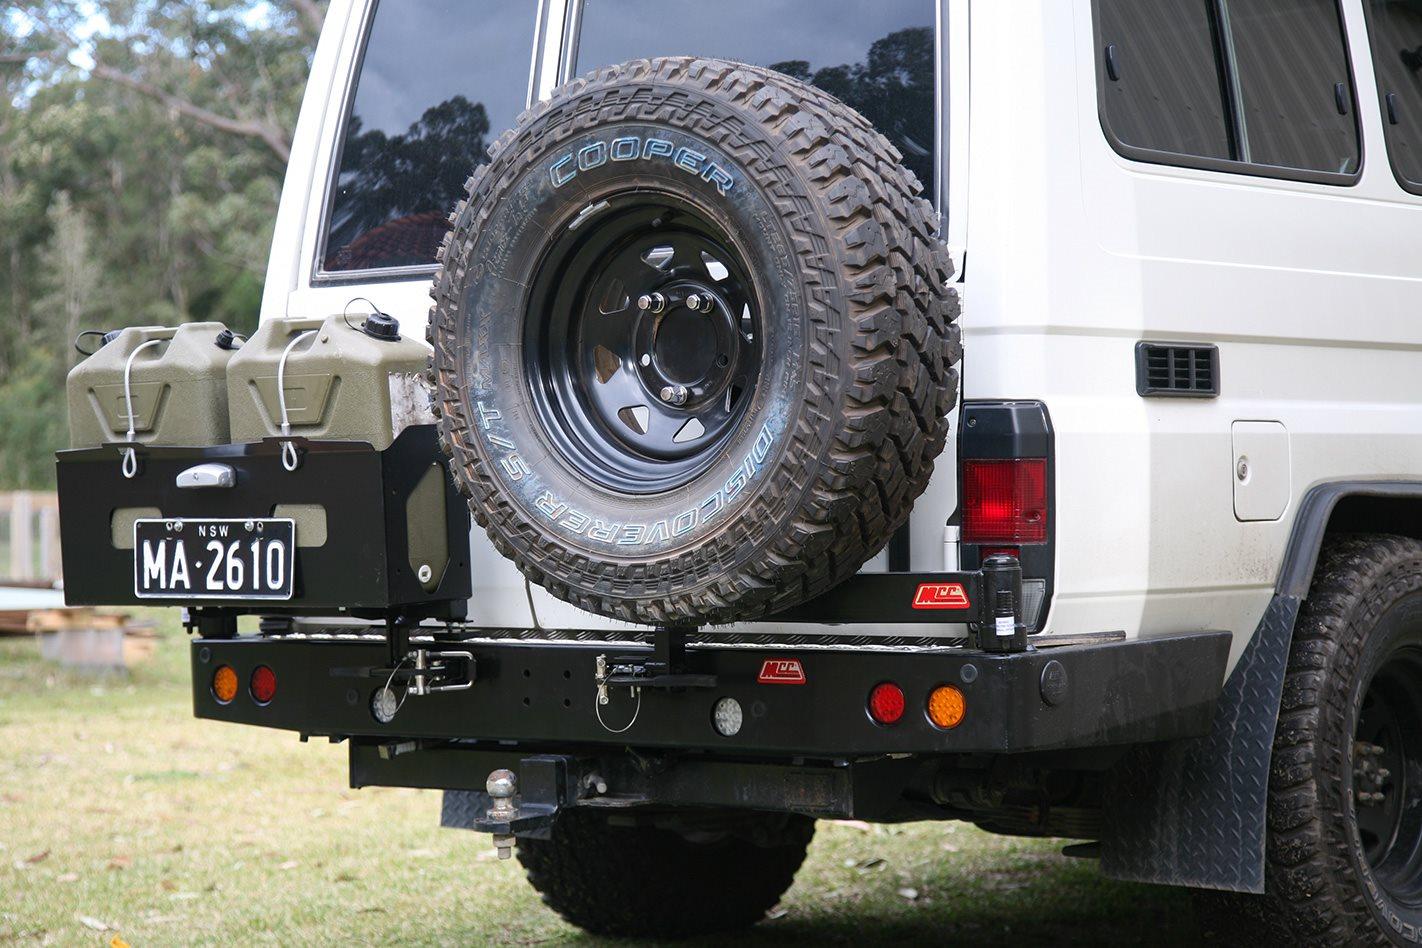 Mcc Rear Wheel Carrier Product Test 4x4 Australia